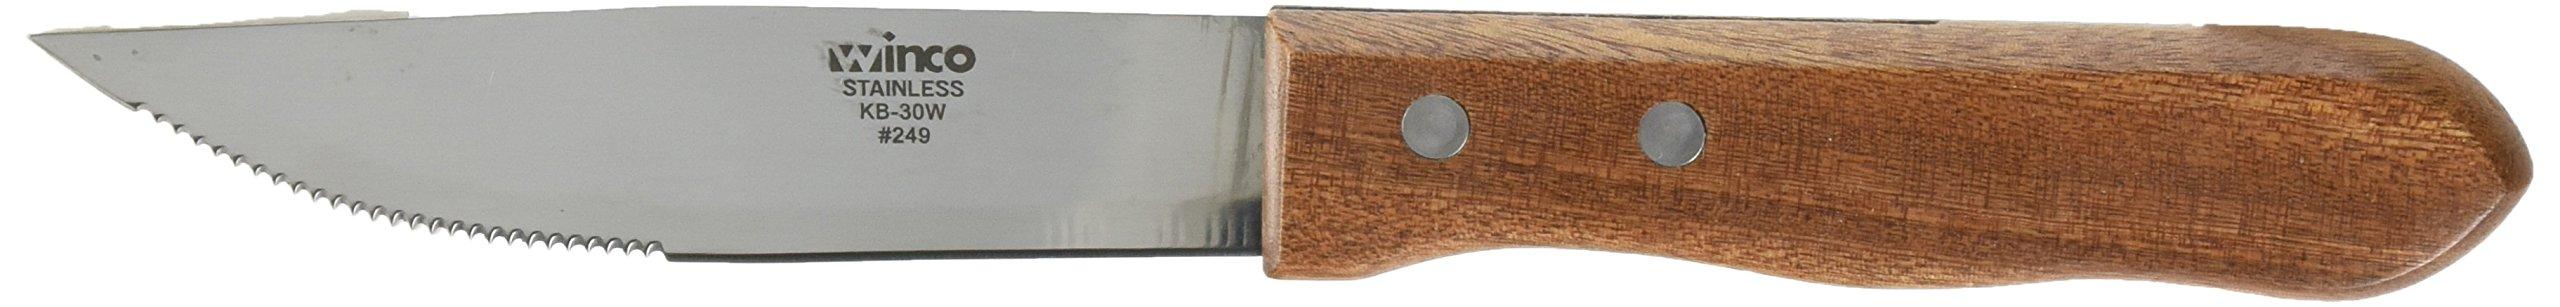 Winco KB-30W Steak Knives, Heavy-Duty Blade with Wood Handle